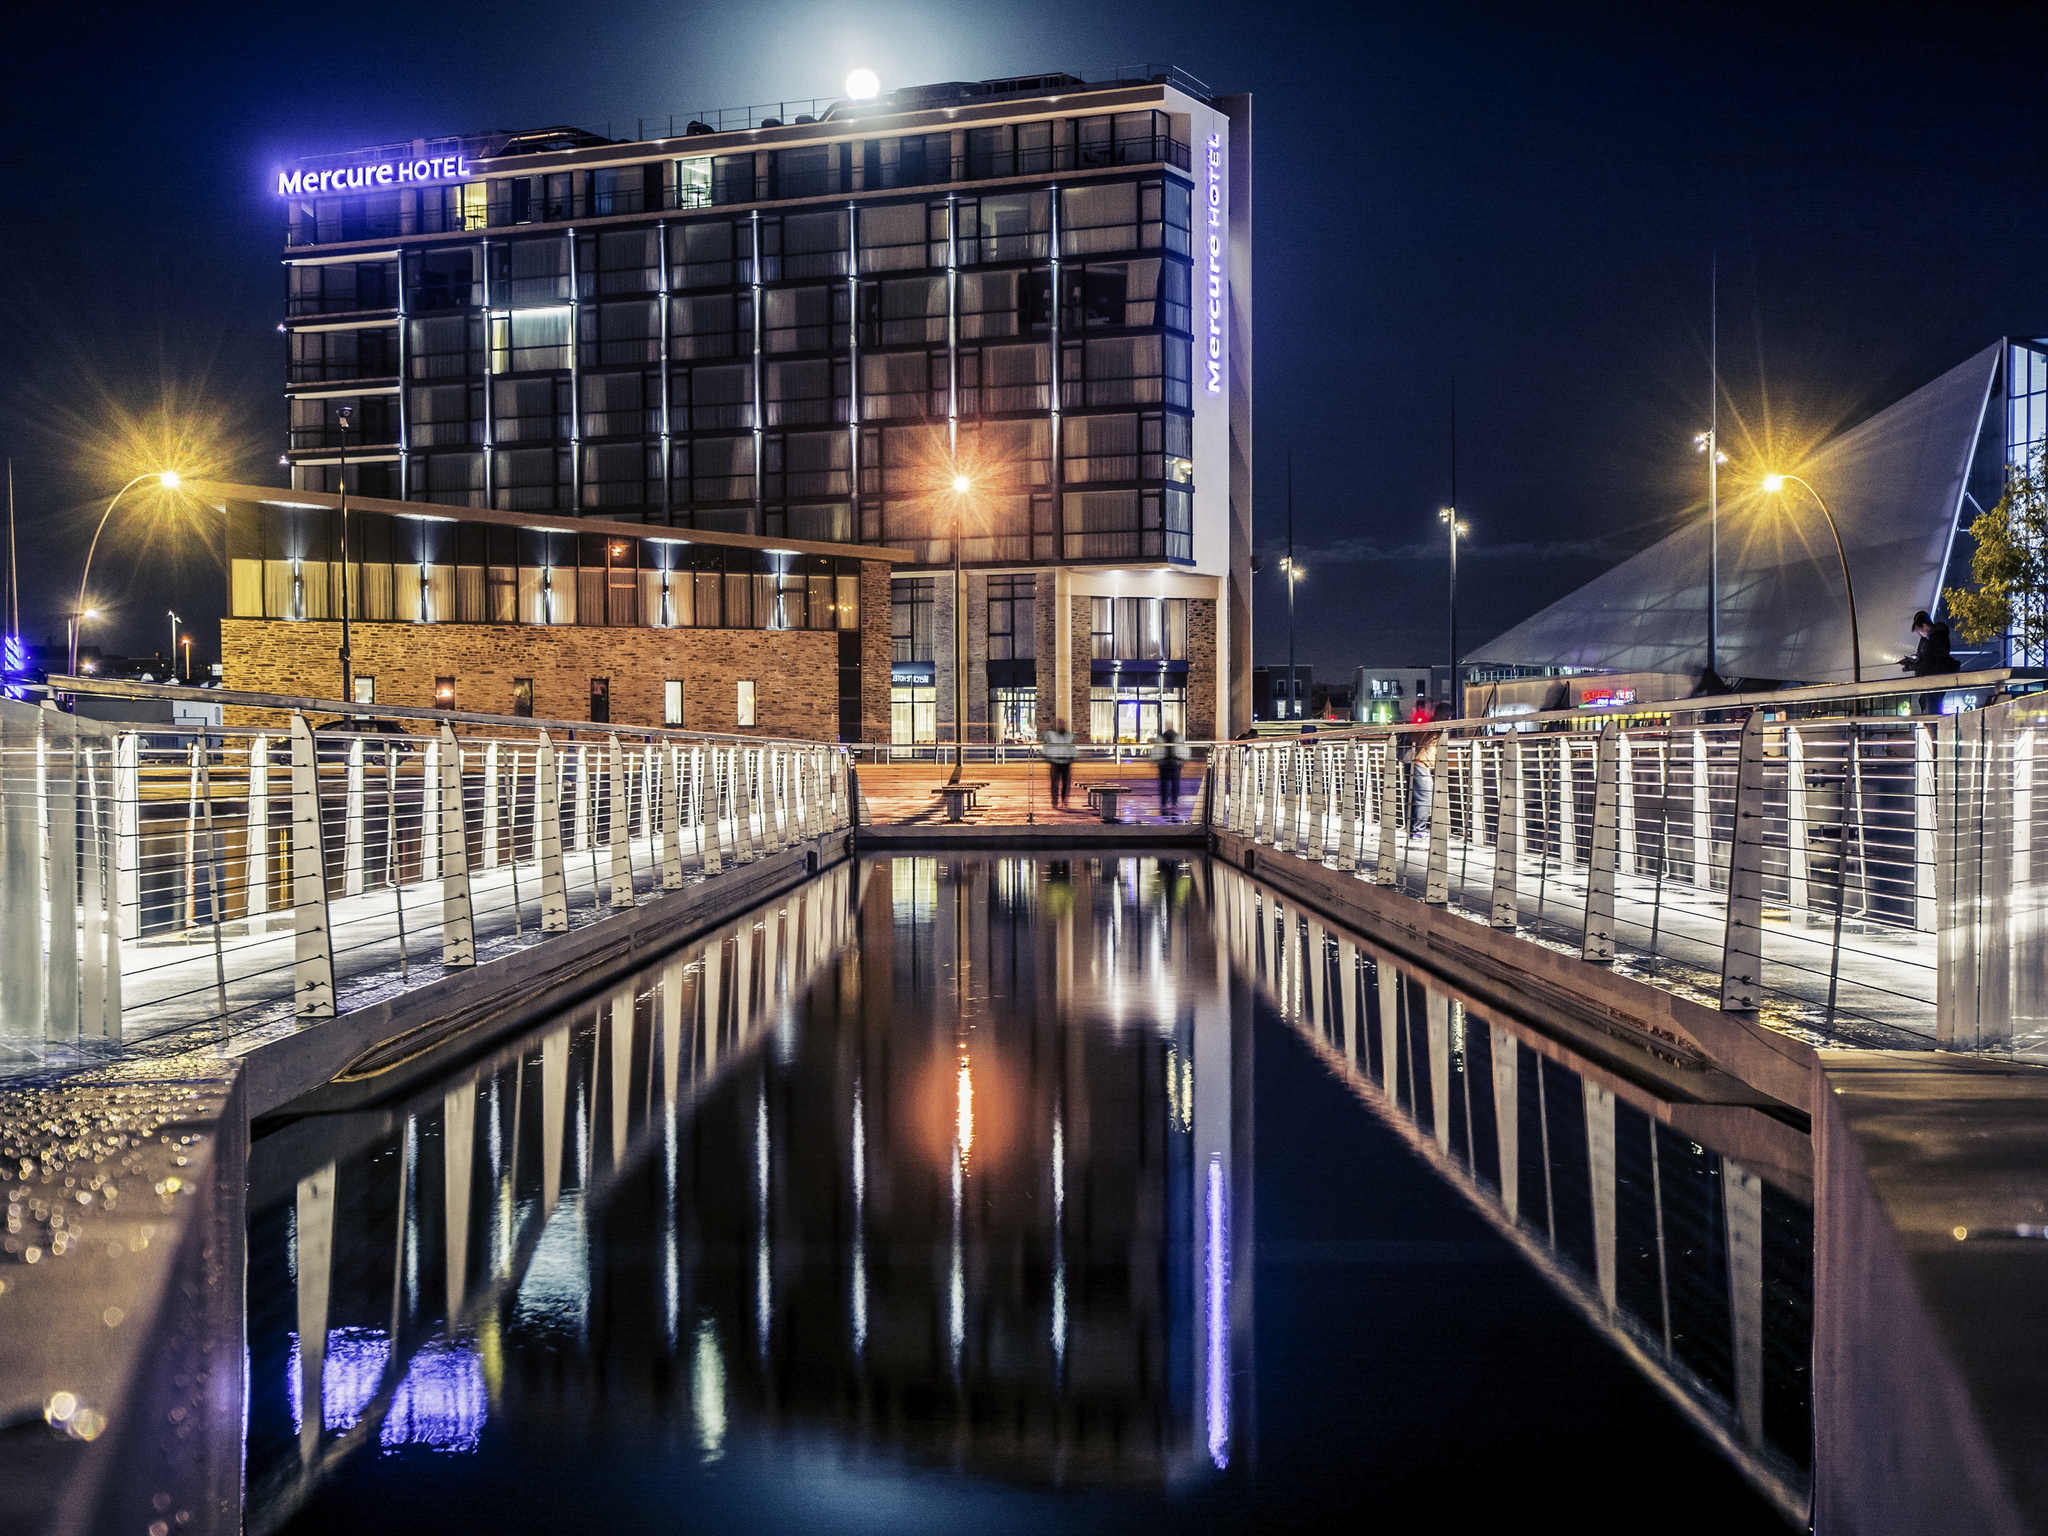 Hotel – Mercure Cherbourg Centre Port hotel